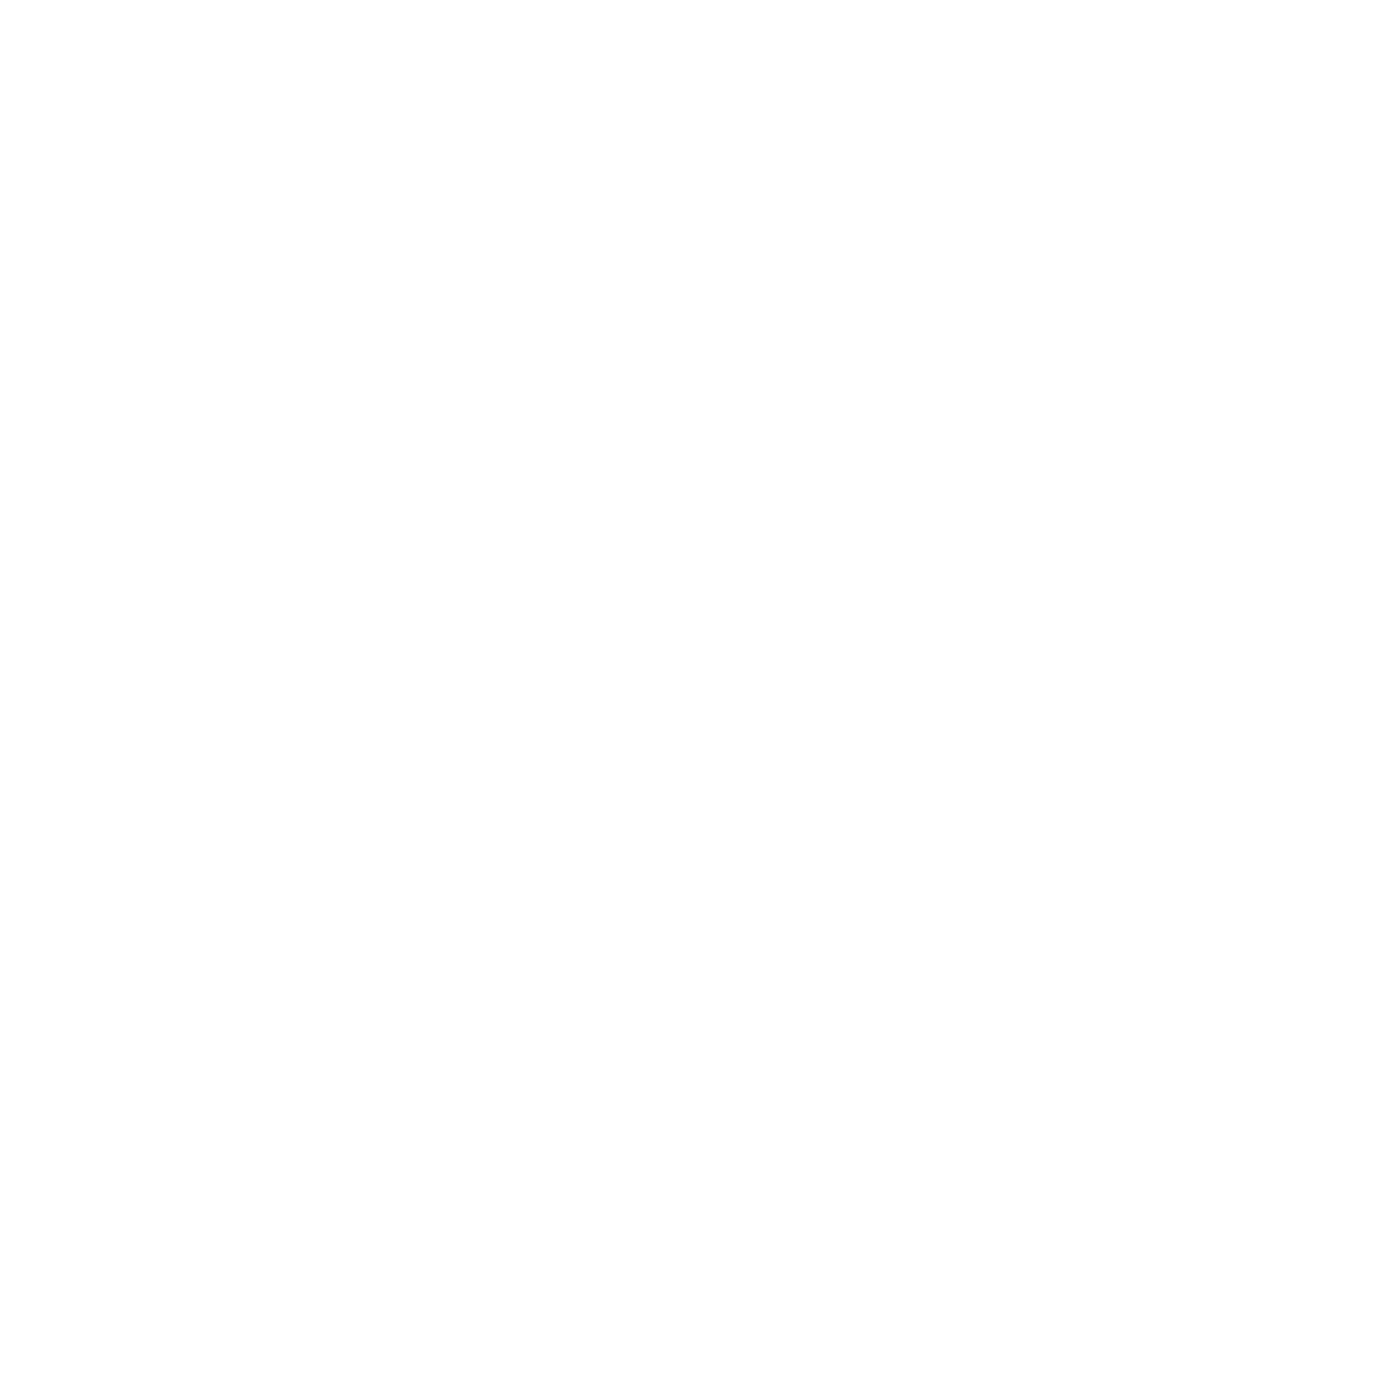 Cosmo City Church